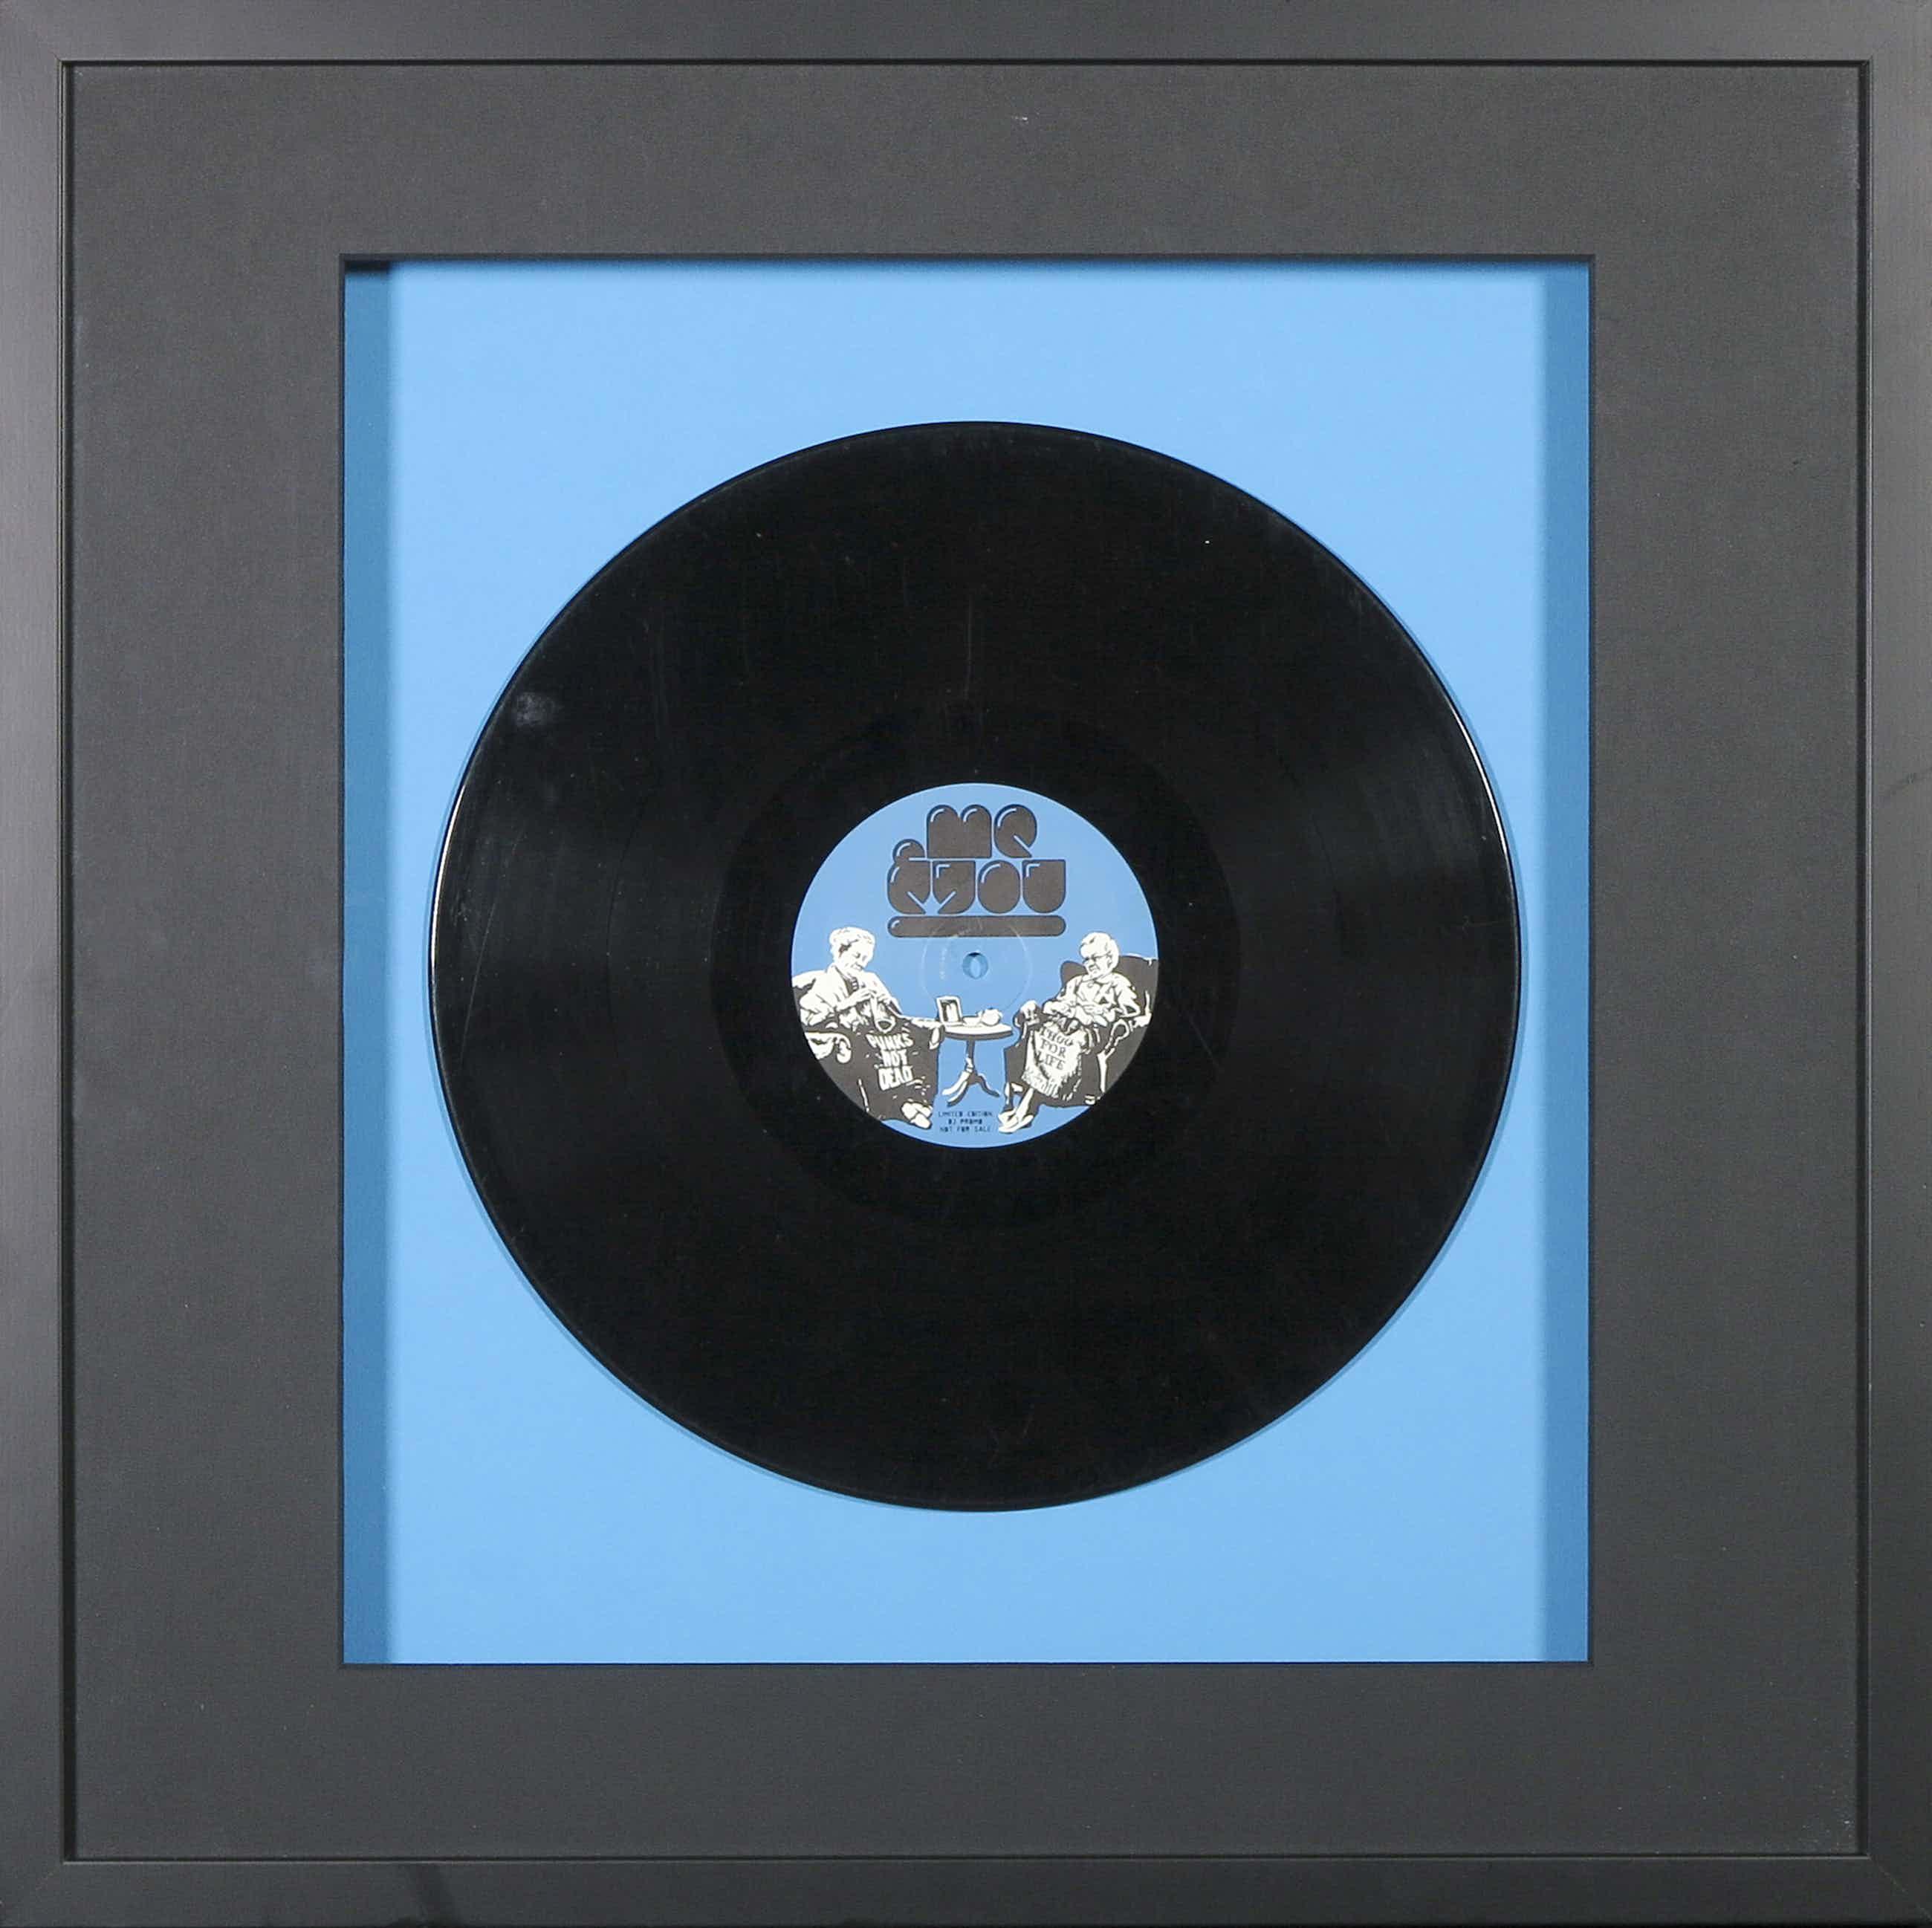 Banksy - Me&You /Various - Rebtuz Presents Birthdays EP - Ingelijst kopen? Bied vanaf 150!